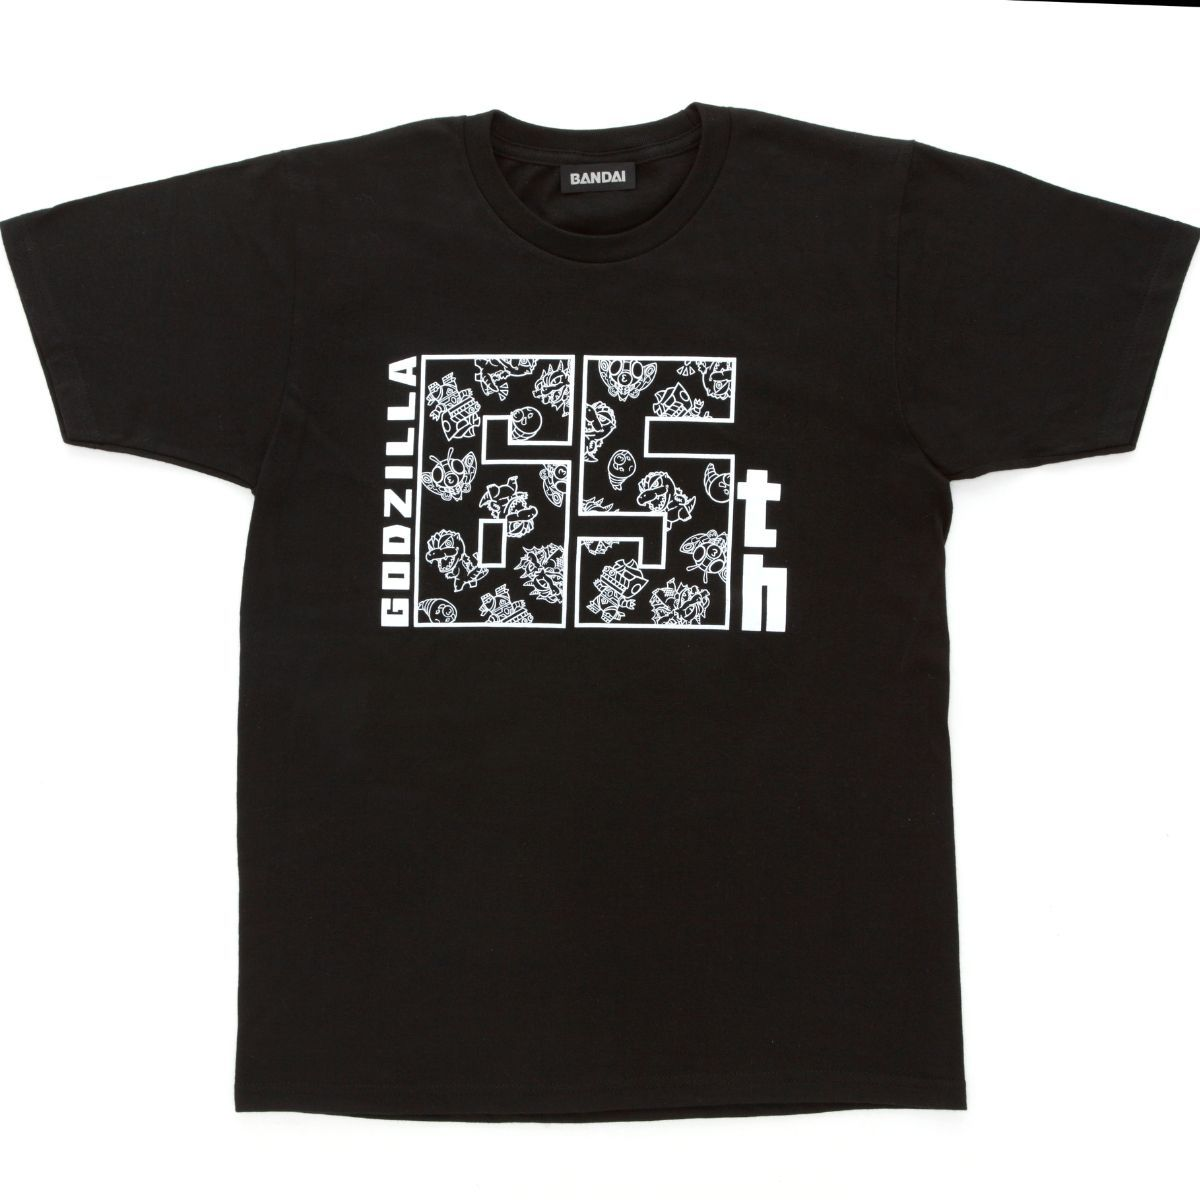 Super-Deformed Godzilla Monsters T-shirt - 65th Anniversary ver.